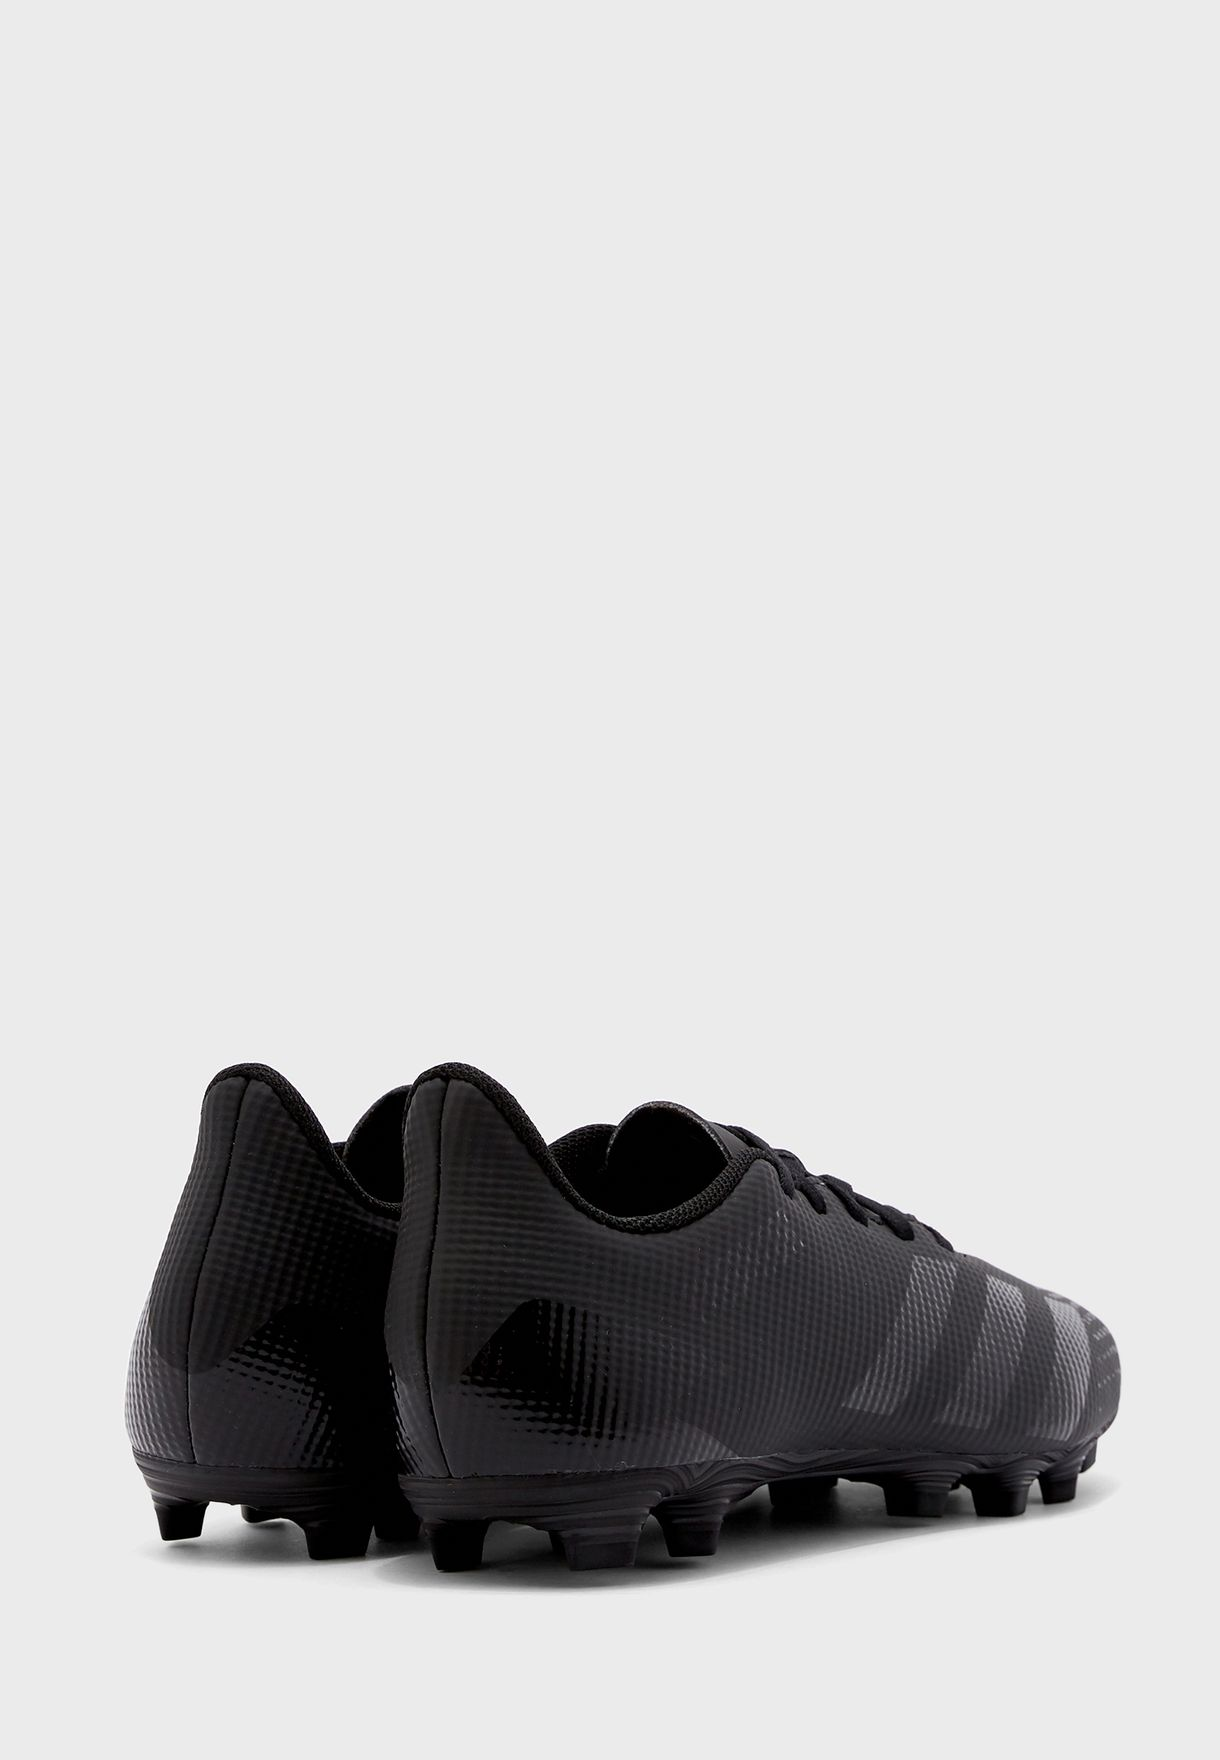 حذاء بردياتور 20.4 اف اكس جي